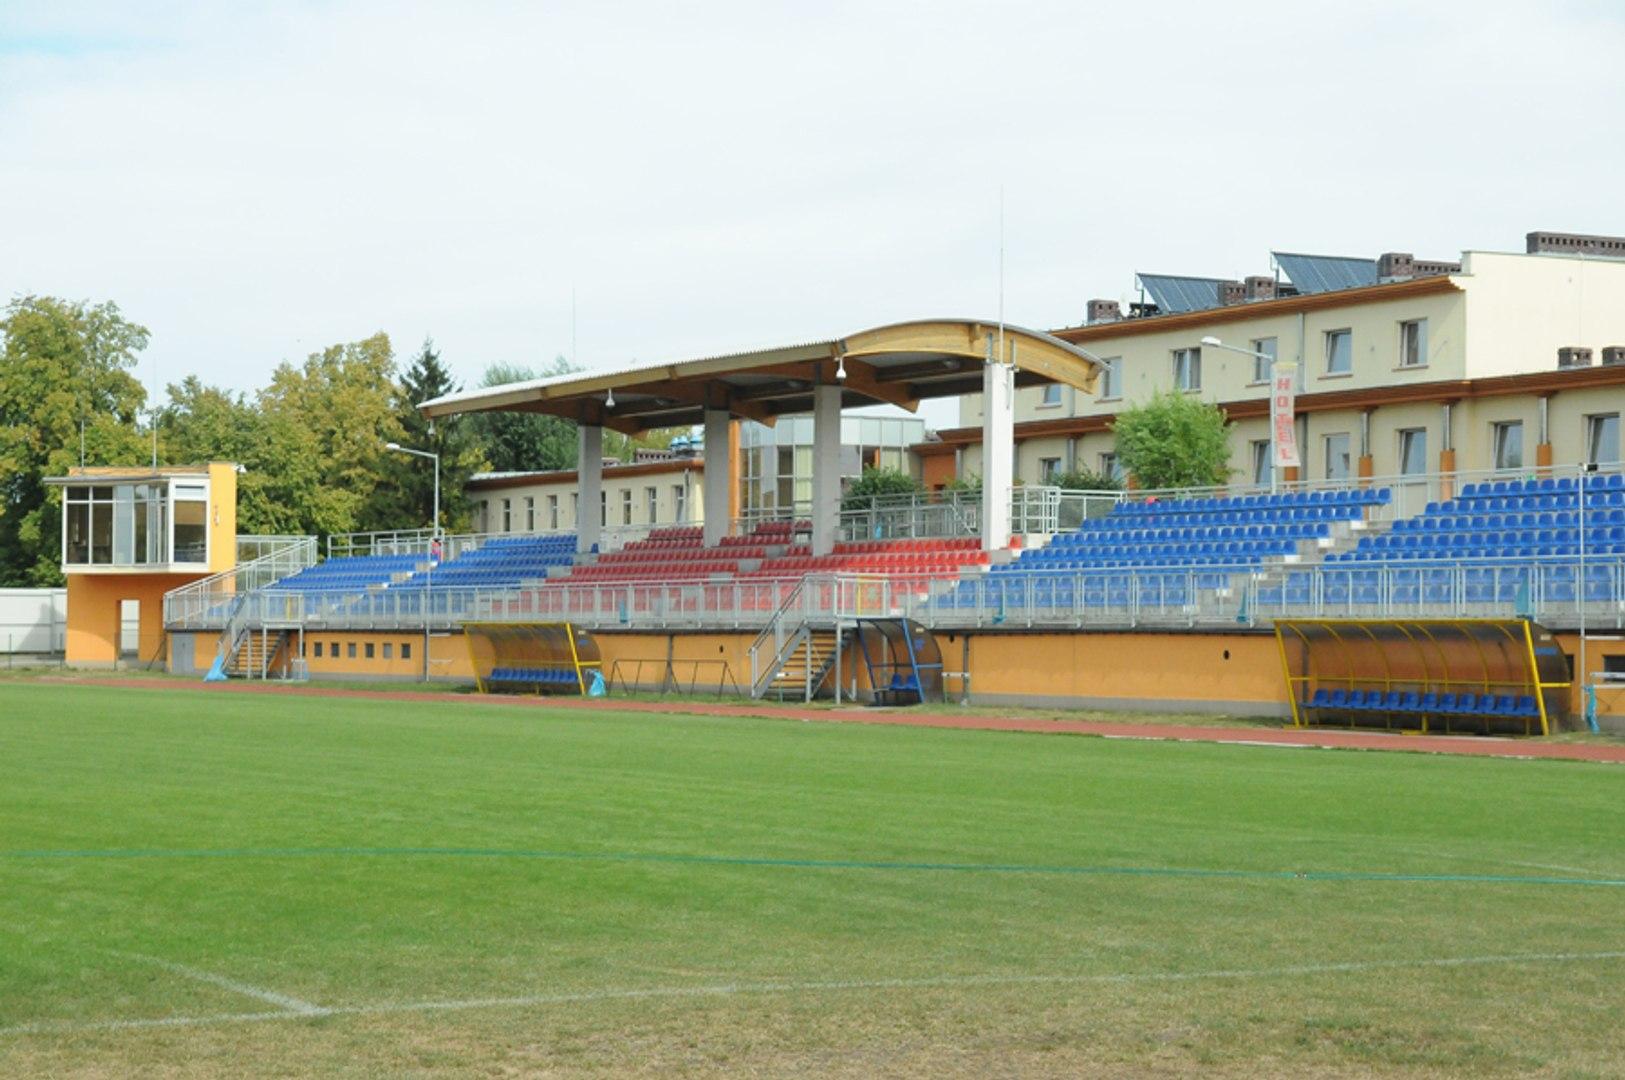 RUGBY EUROPE GIRLS U18 SEVENS CHAMPIONSHIP 2019 - JAROCIN